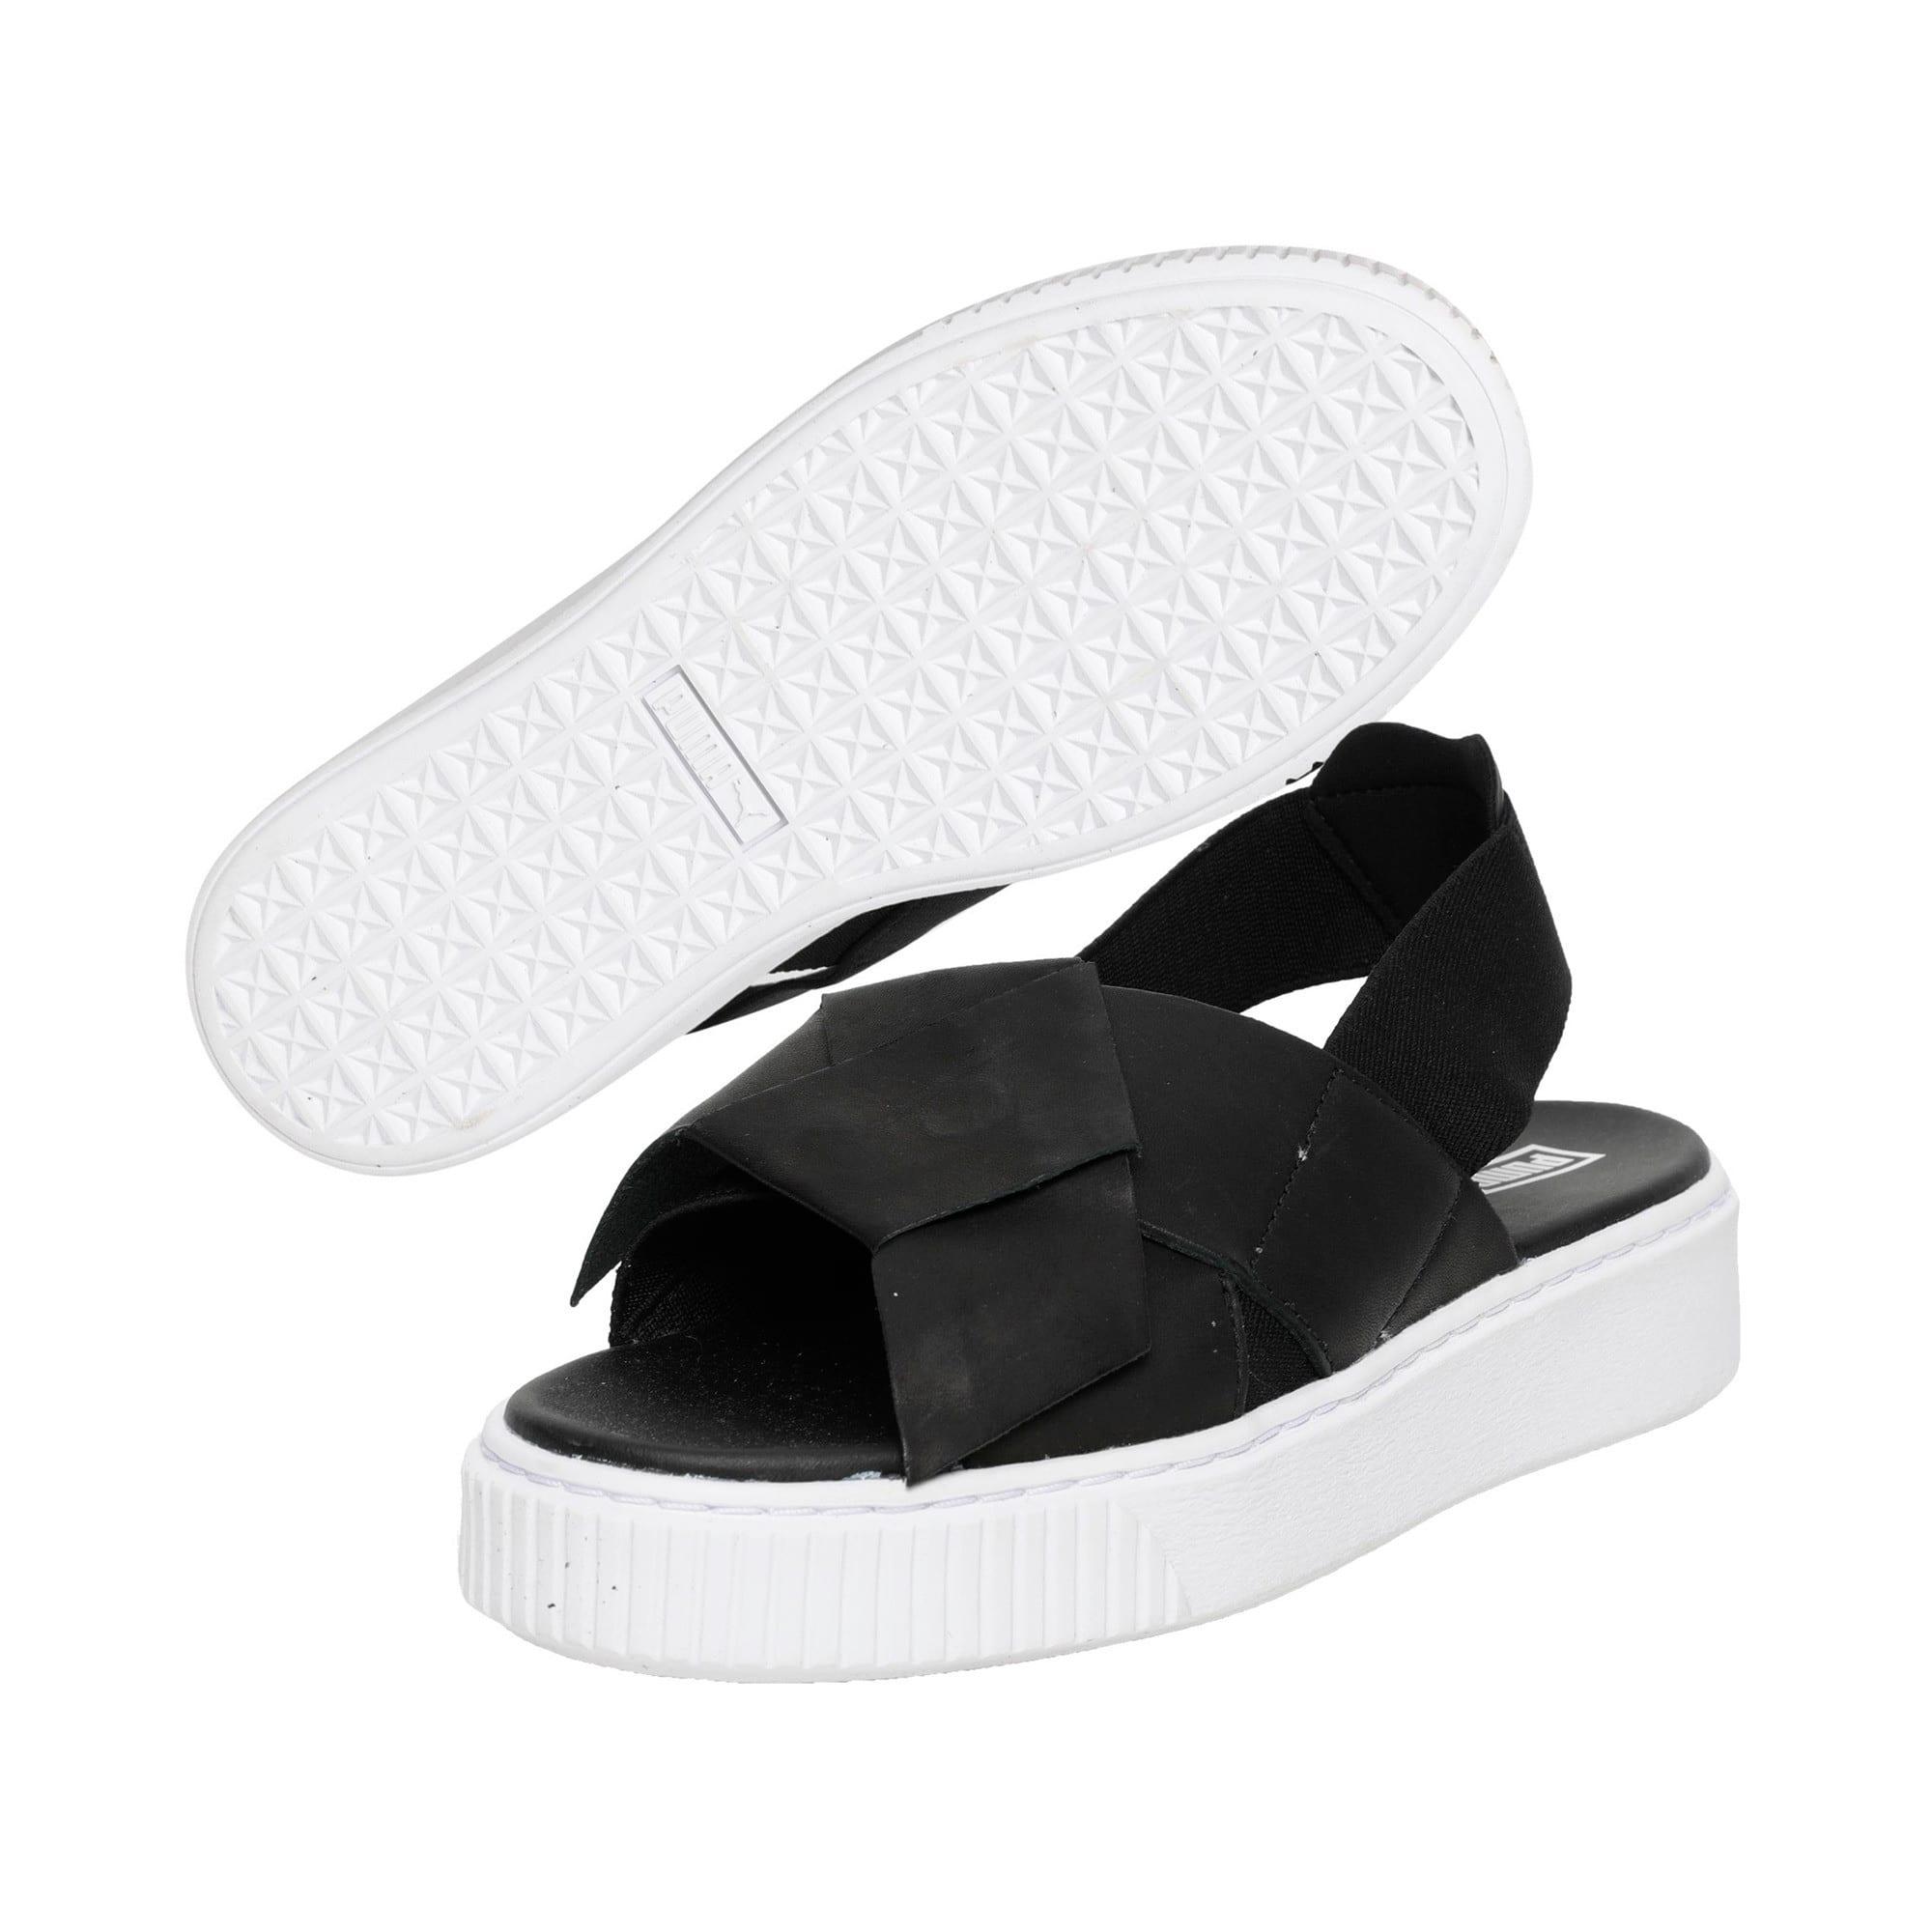 Thumbnail 3 of Platform Leather Women's Sandals, Puma Black-Puma Black, medium-IND